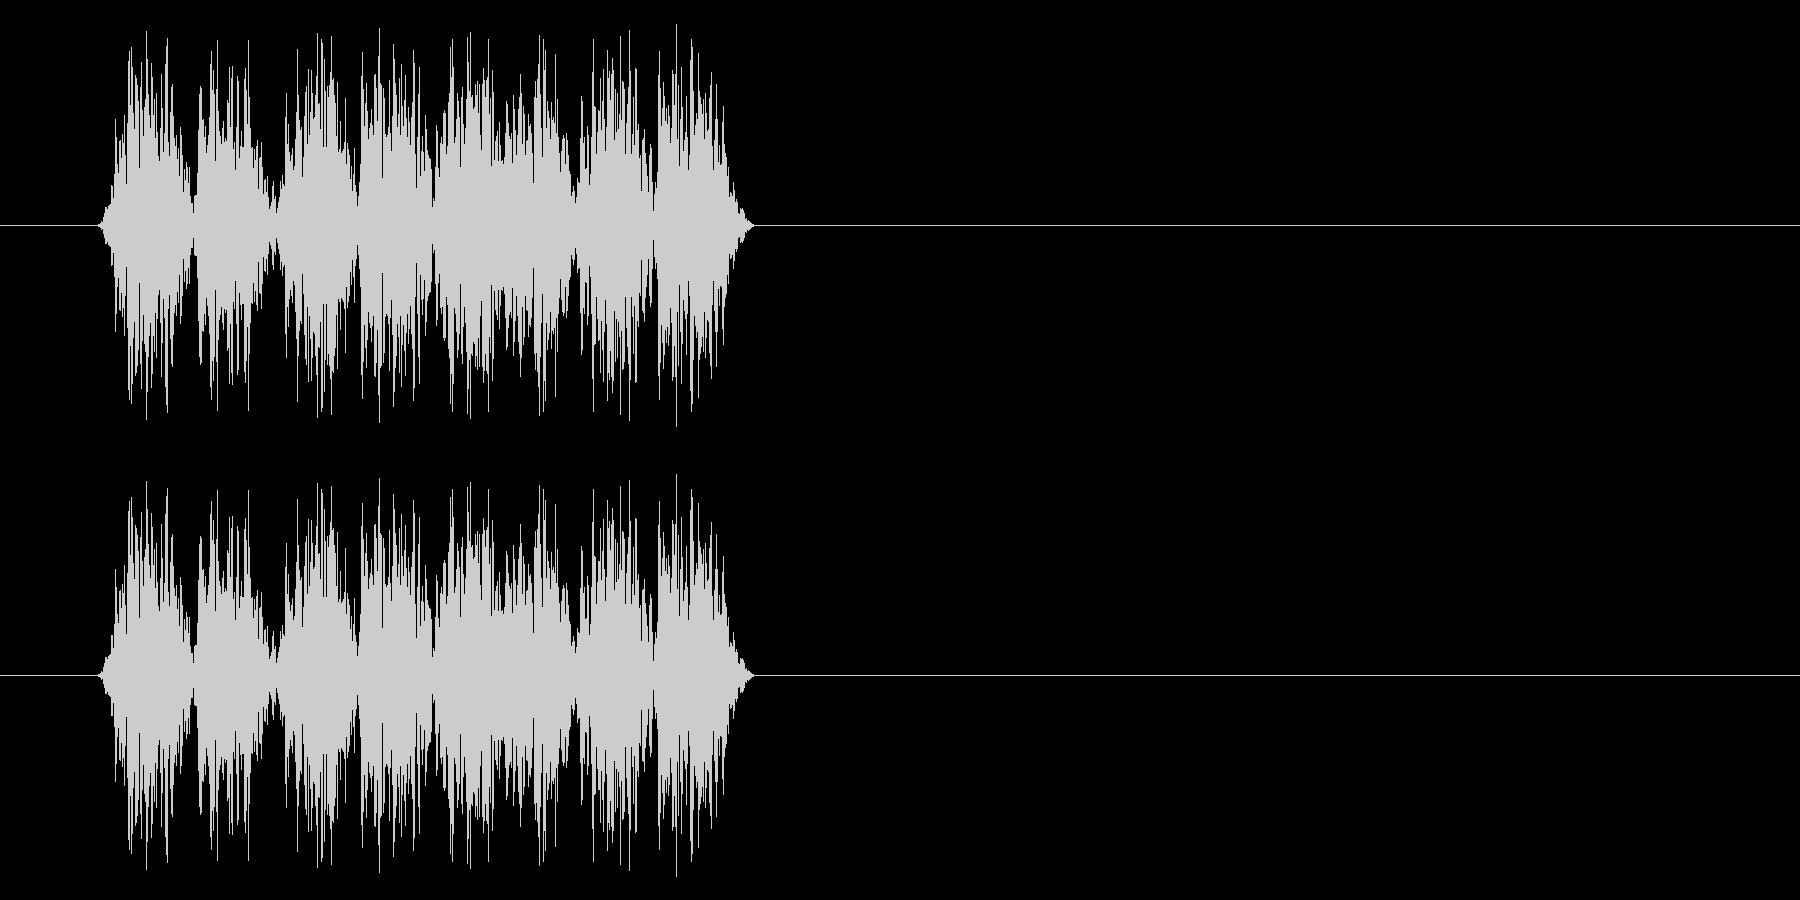 SNES レース02-06(タイヤ スキの未再生の波形